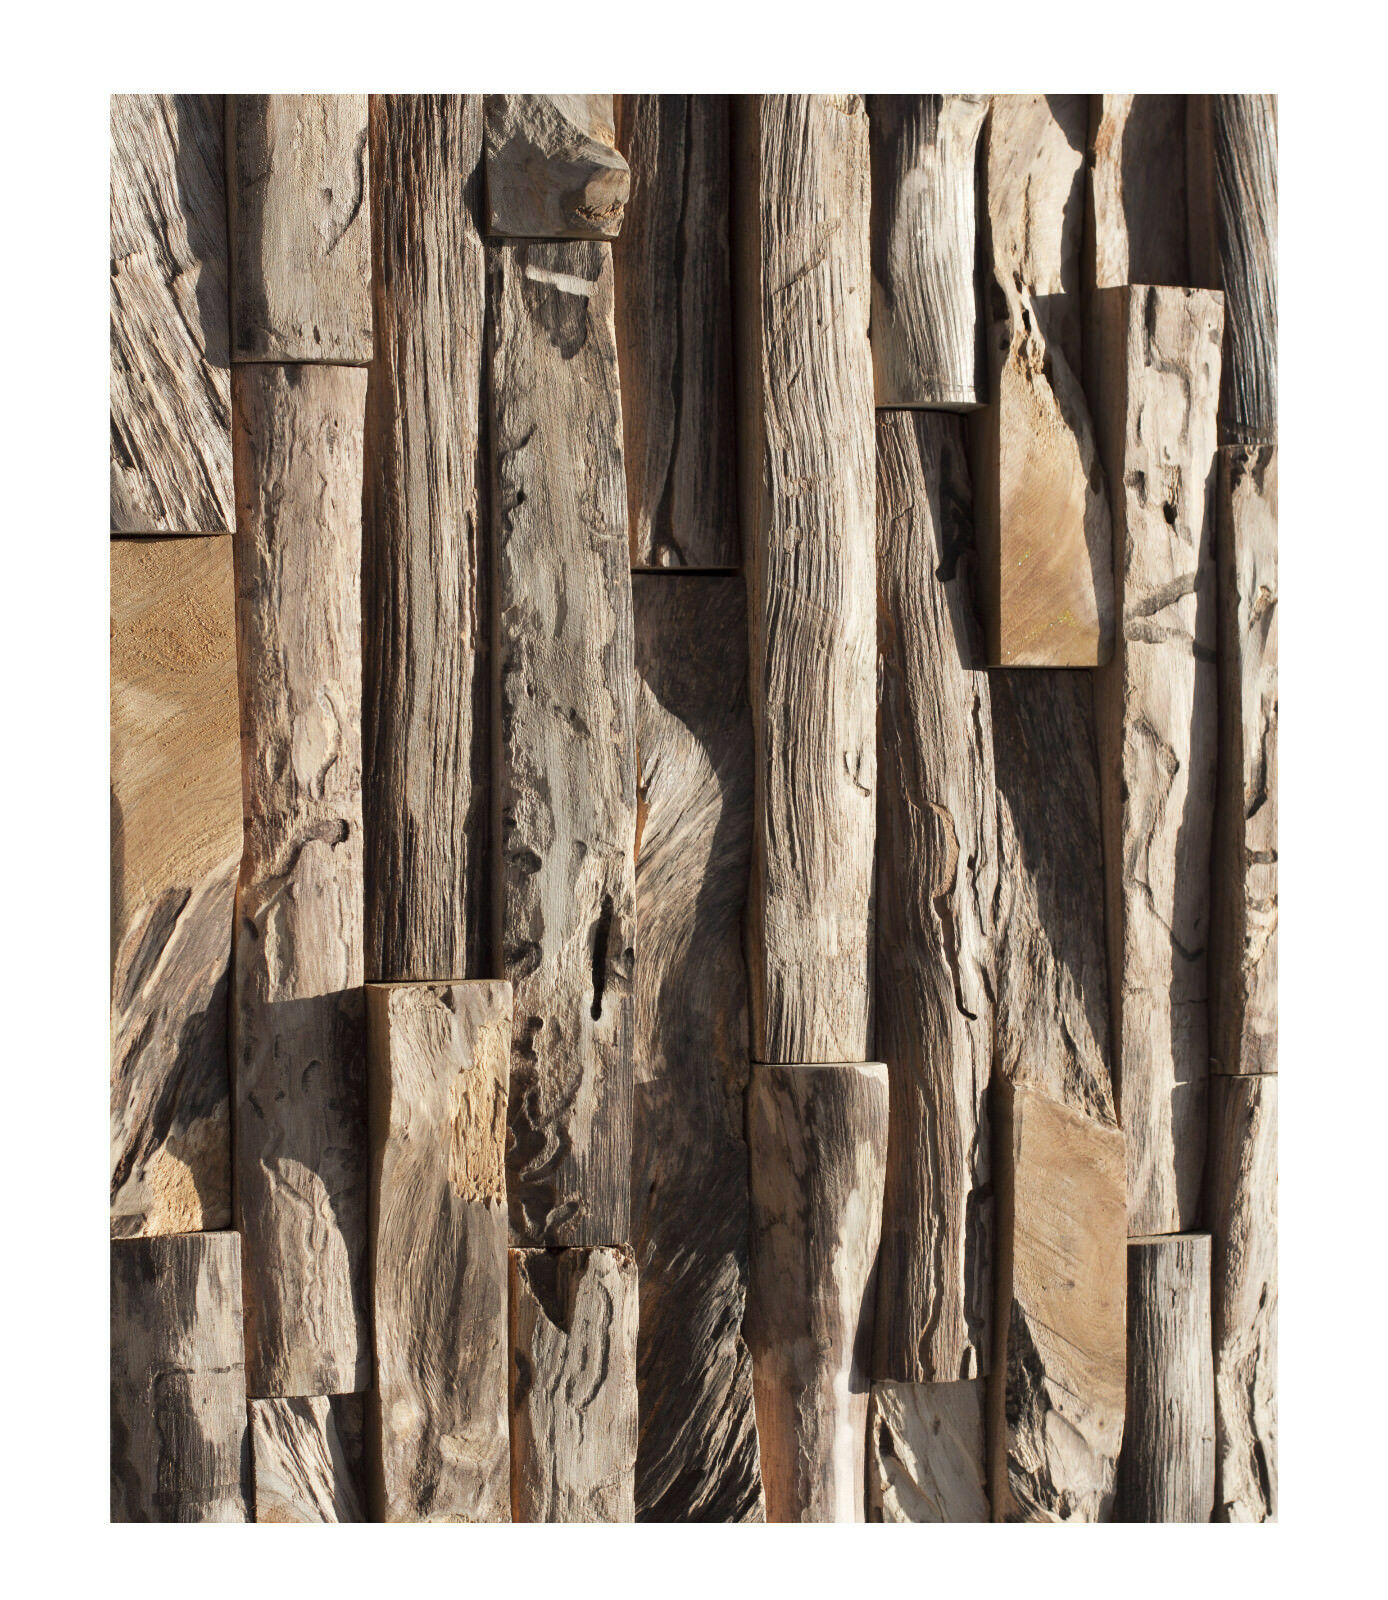 1 qm Teak Holz Mosaikfliesen HO-008 Wandverkleidung Holzwand Wanddekoration